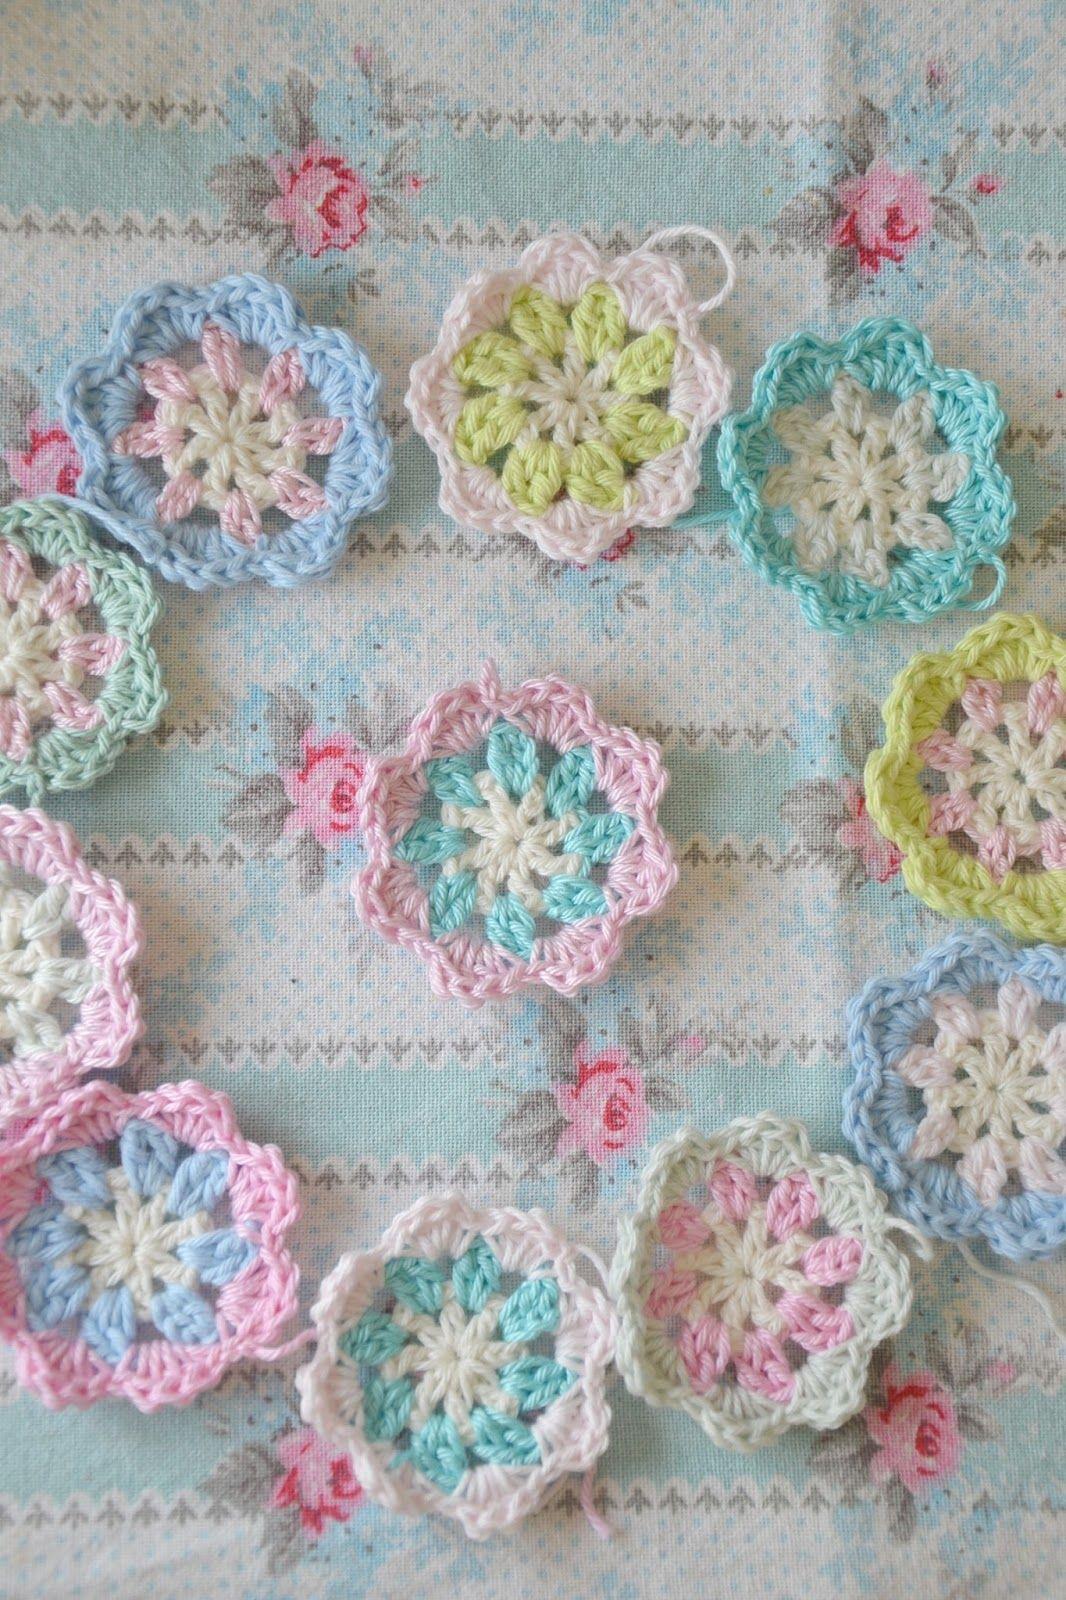 B.TREE | Crochet | Pinterest | Pastell, Blume und Muster